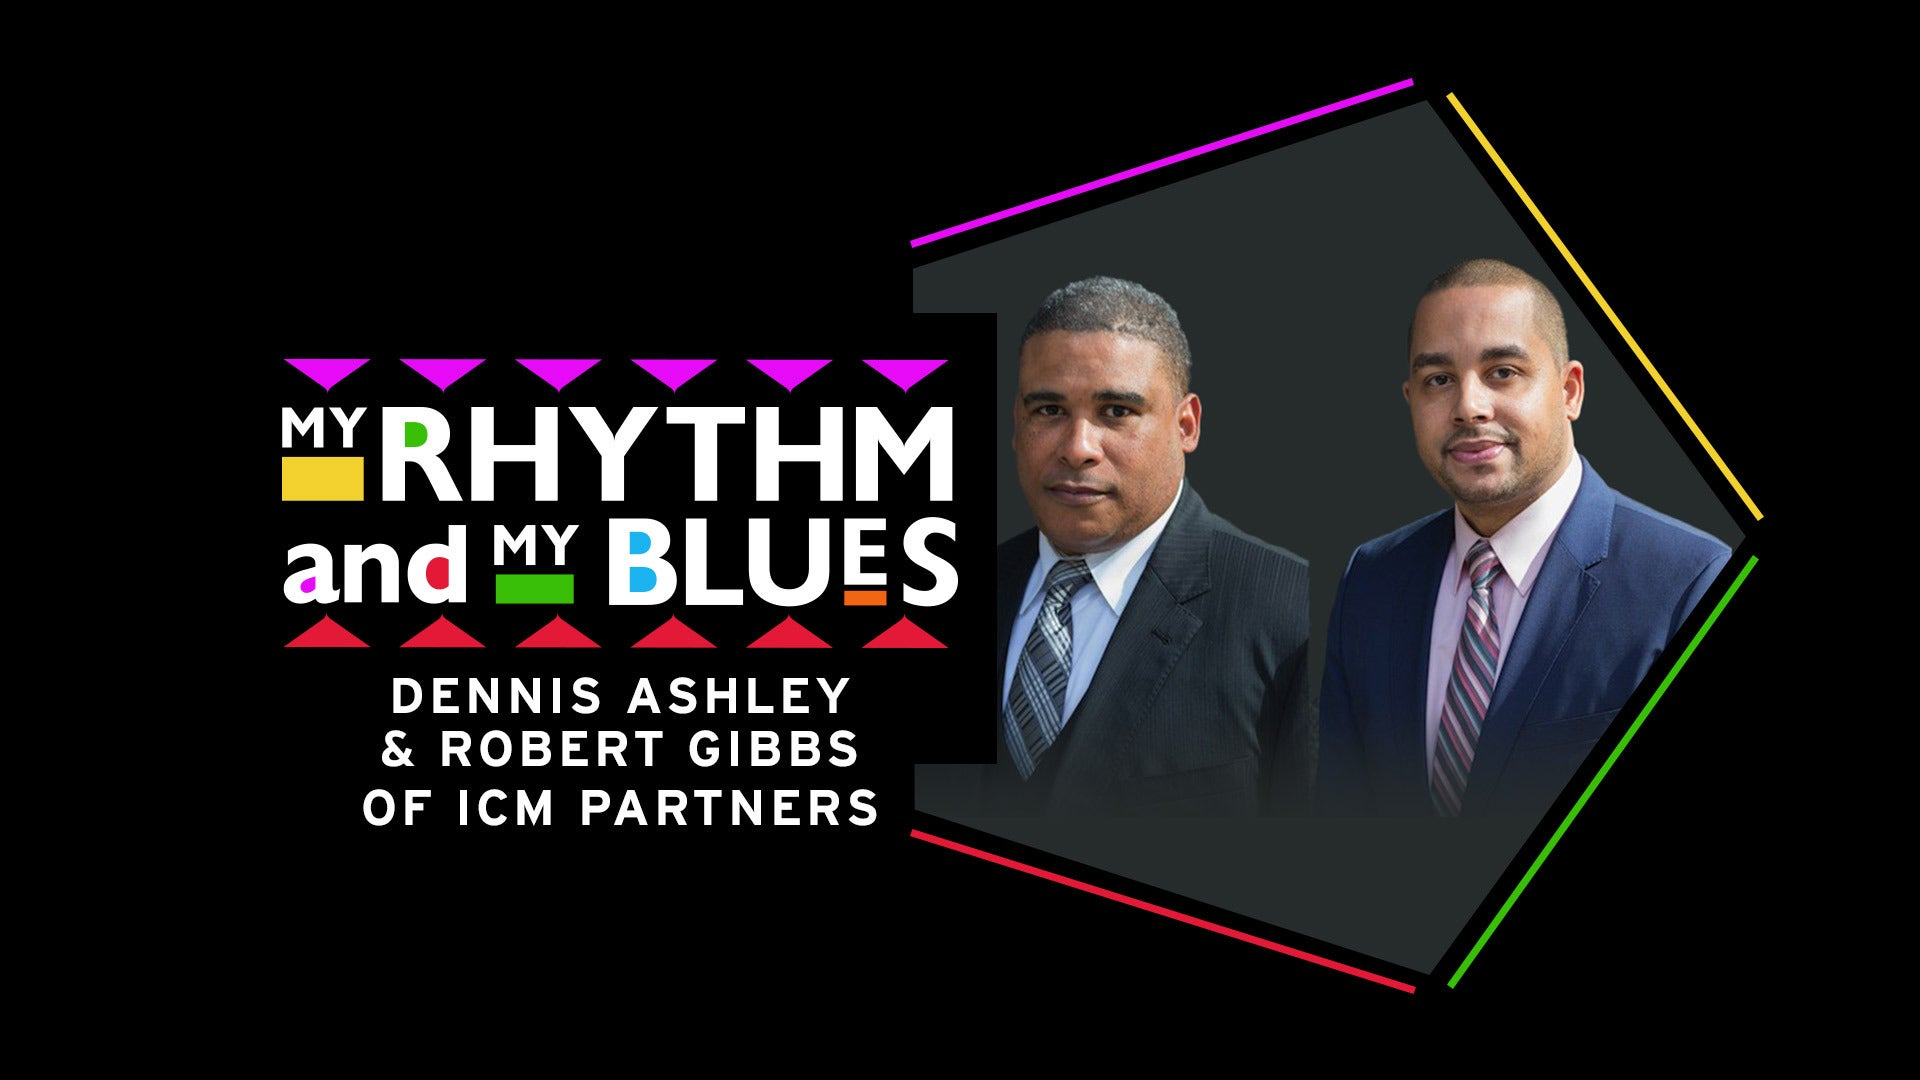 My Rhythm and My Blues: Robert Gibbs (Head of Music) & Dennis Ashley of ICM Partners